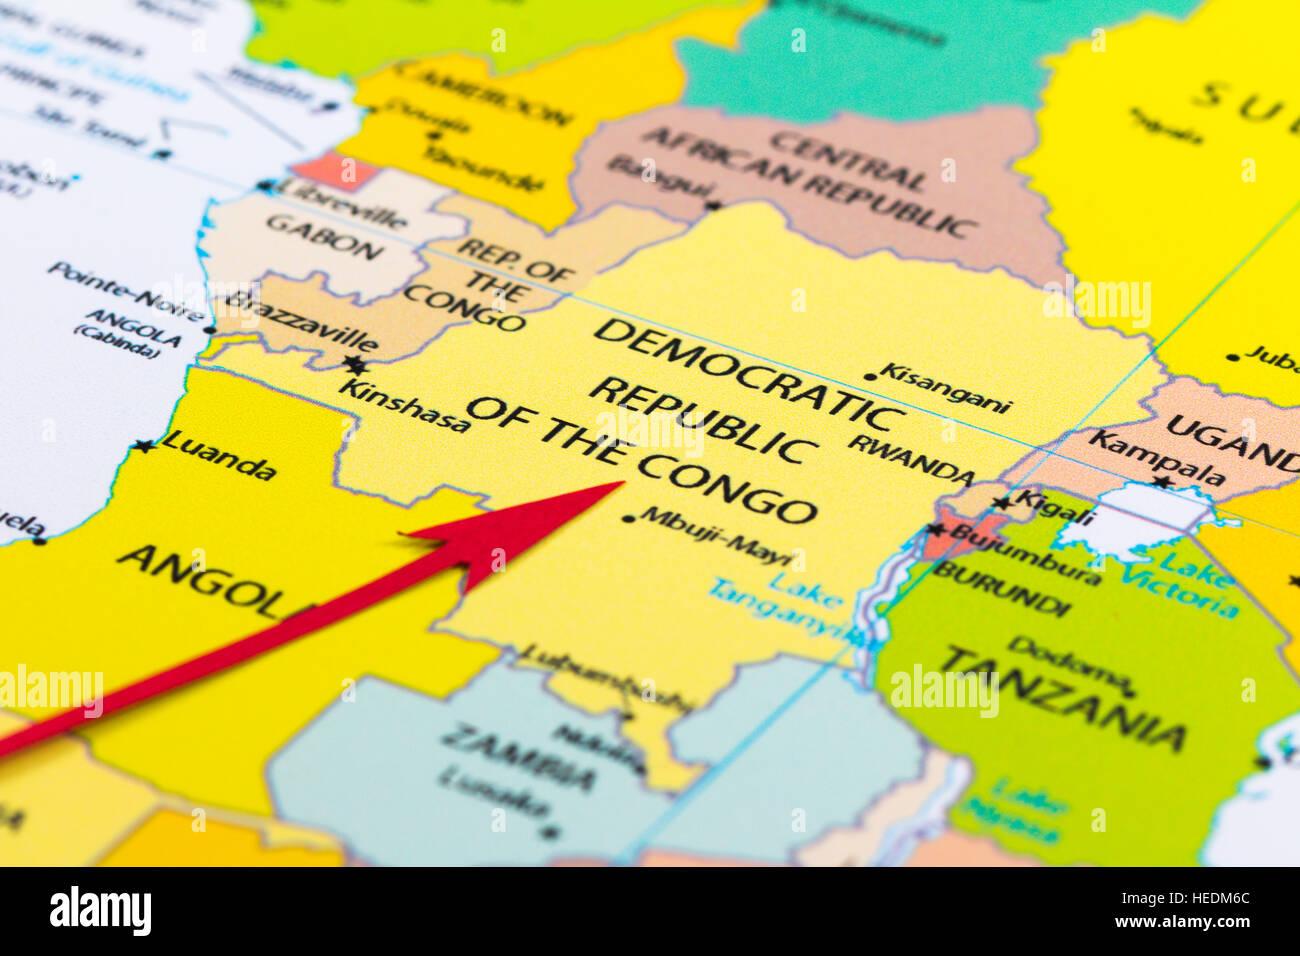 Democratic Republic Congo Africa Map Stock Photos & Democratic ... on